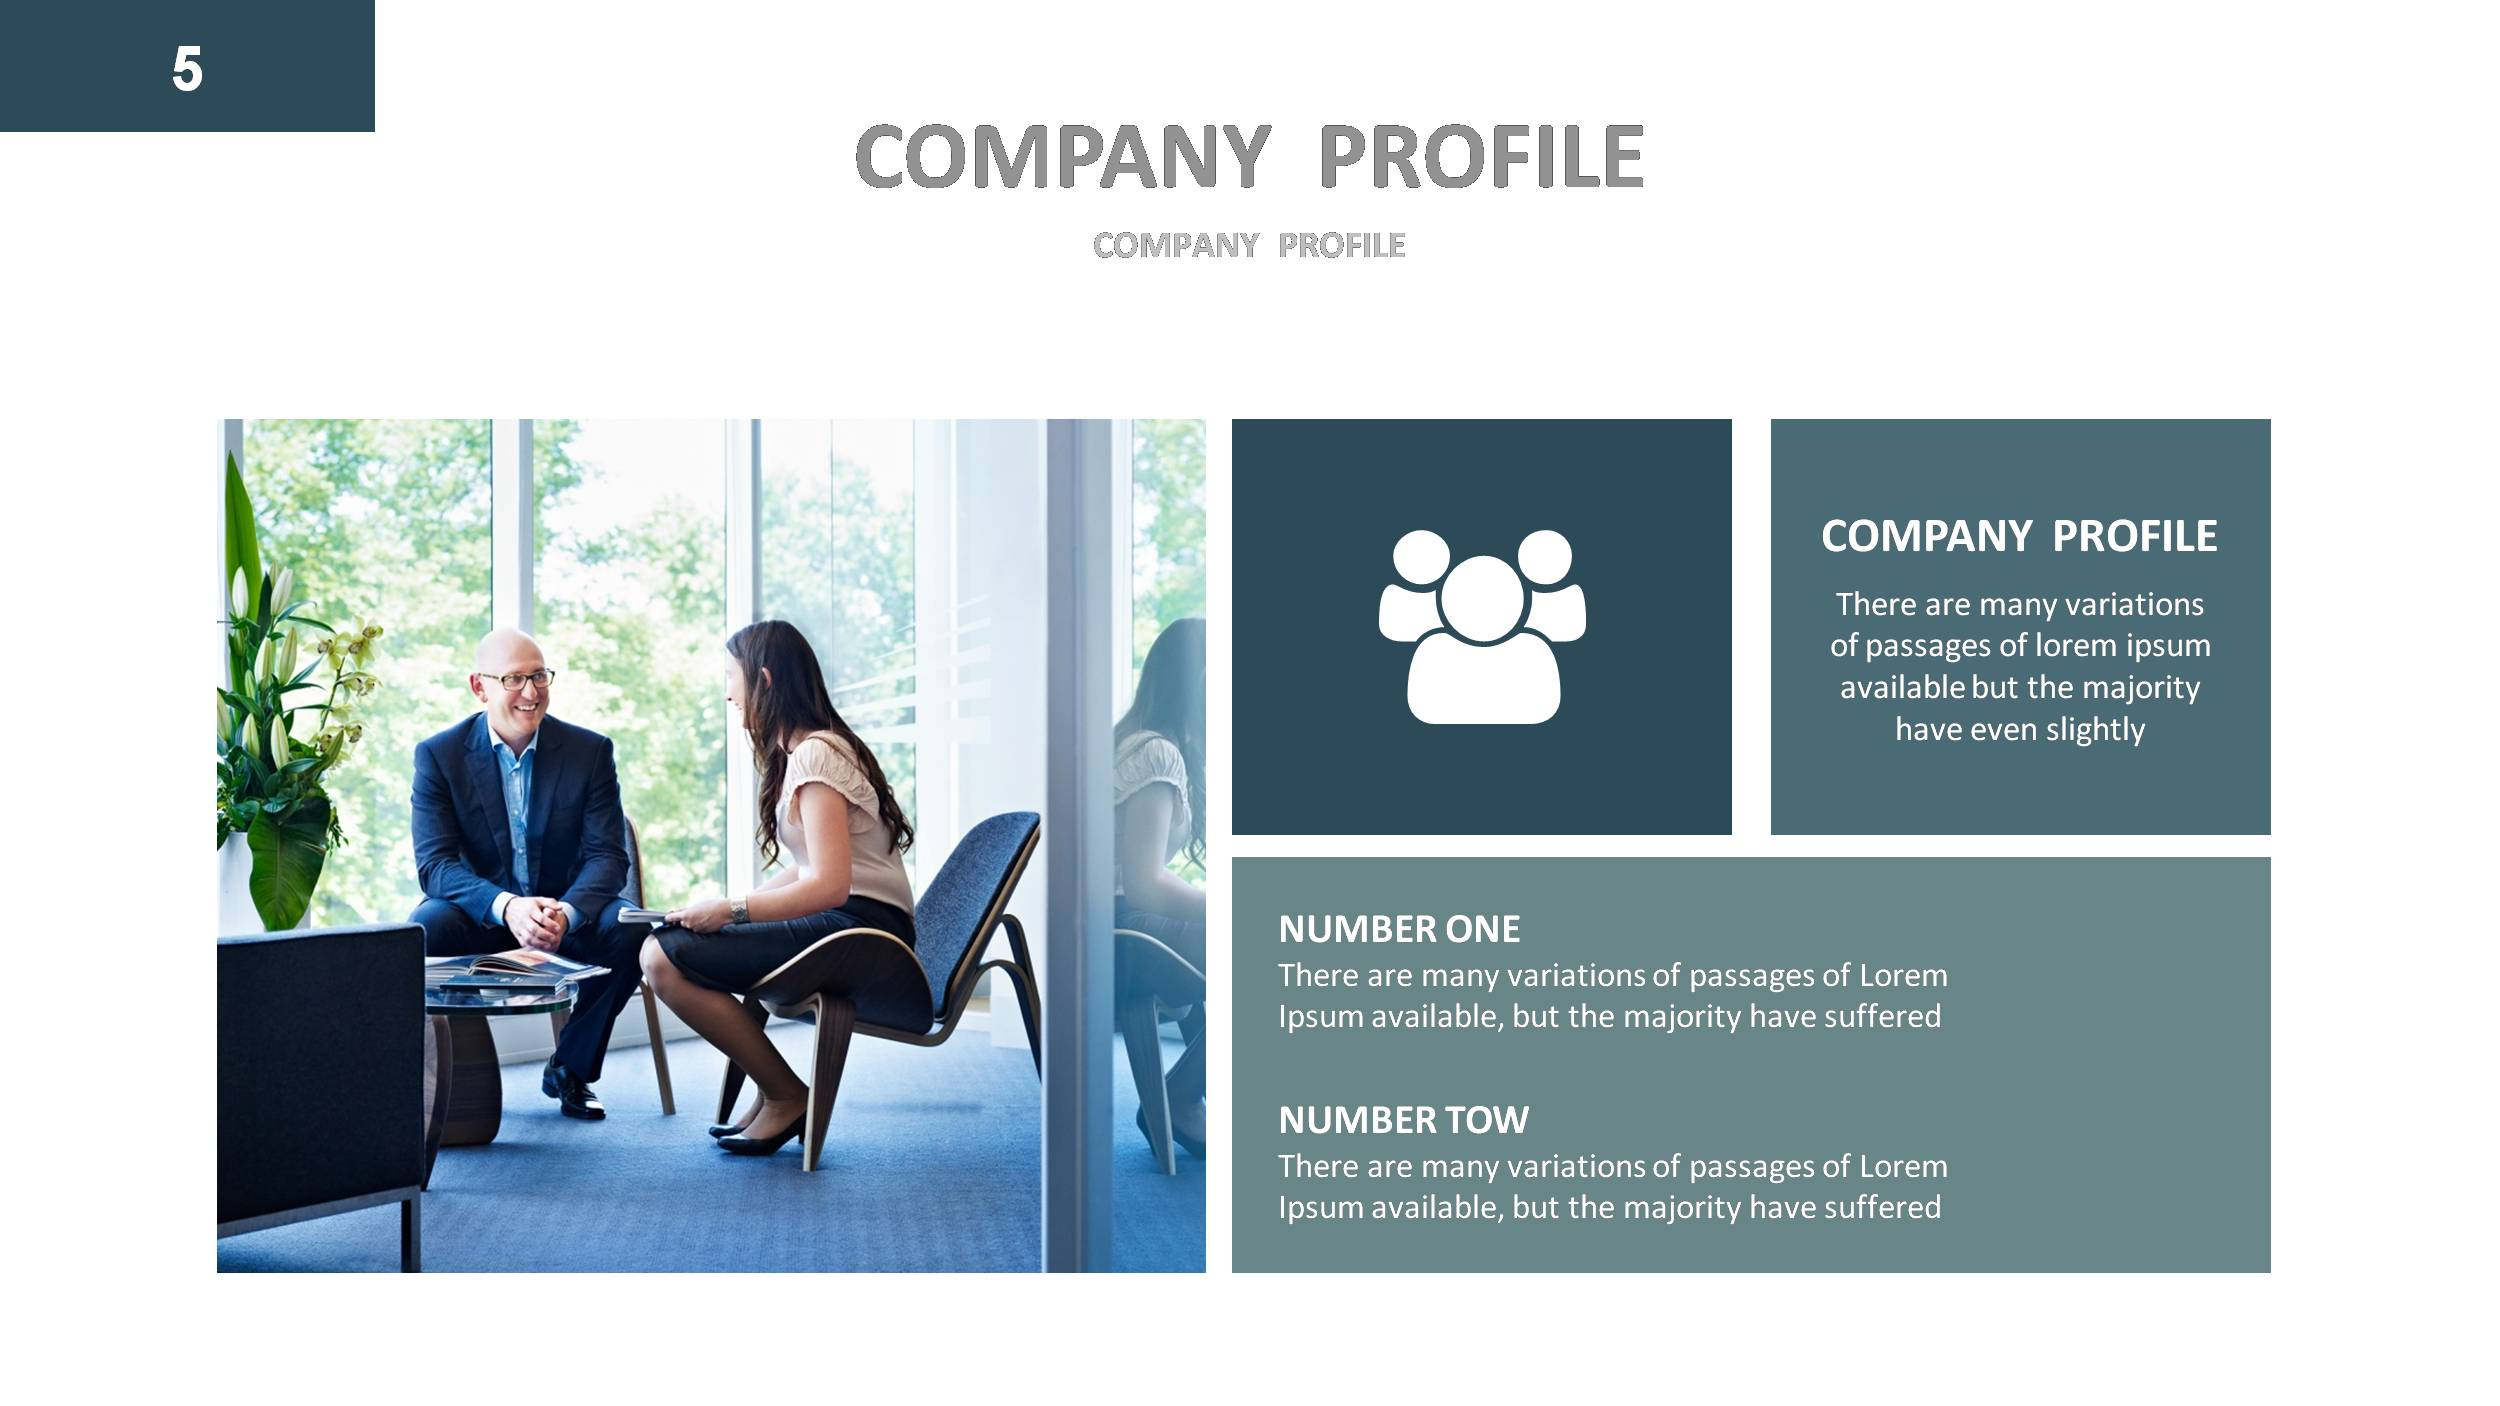 Company profile powerpoint presentation template by gardeniadesign company profile powerpoint presentation template toneelgroepblik Image collections